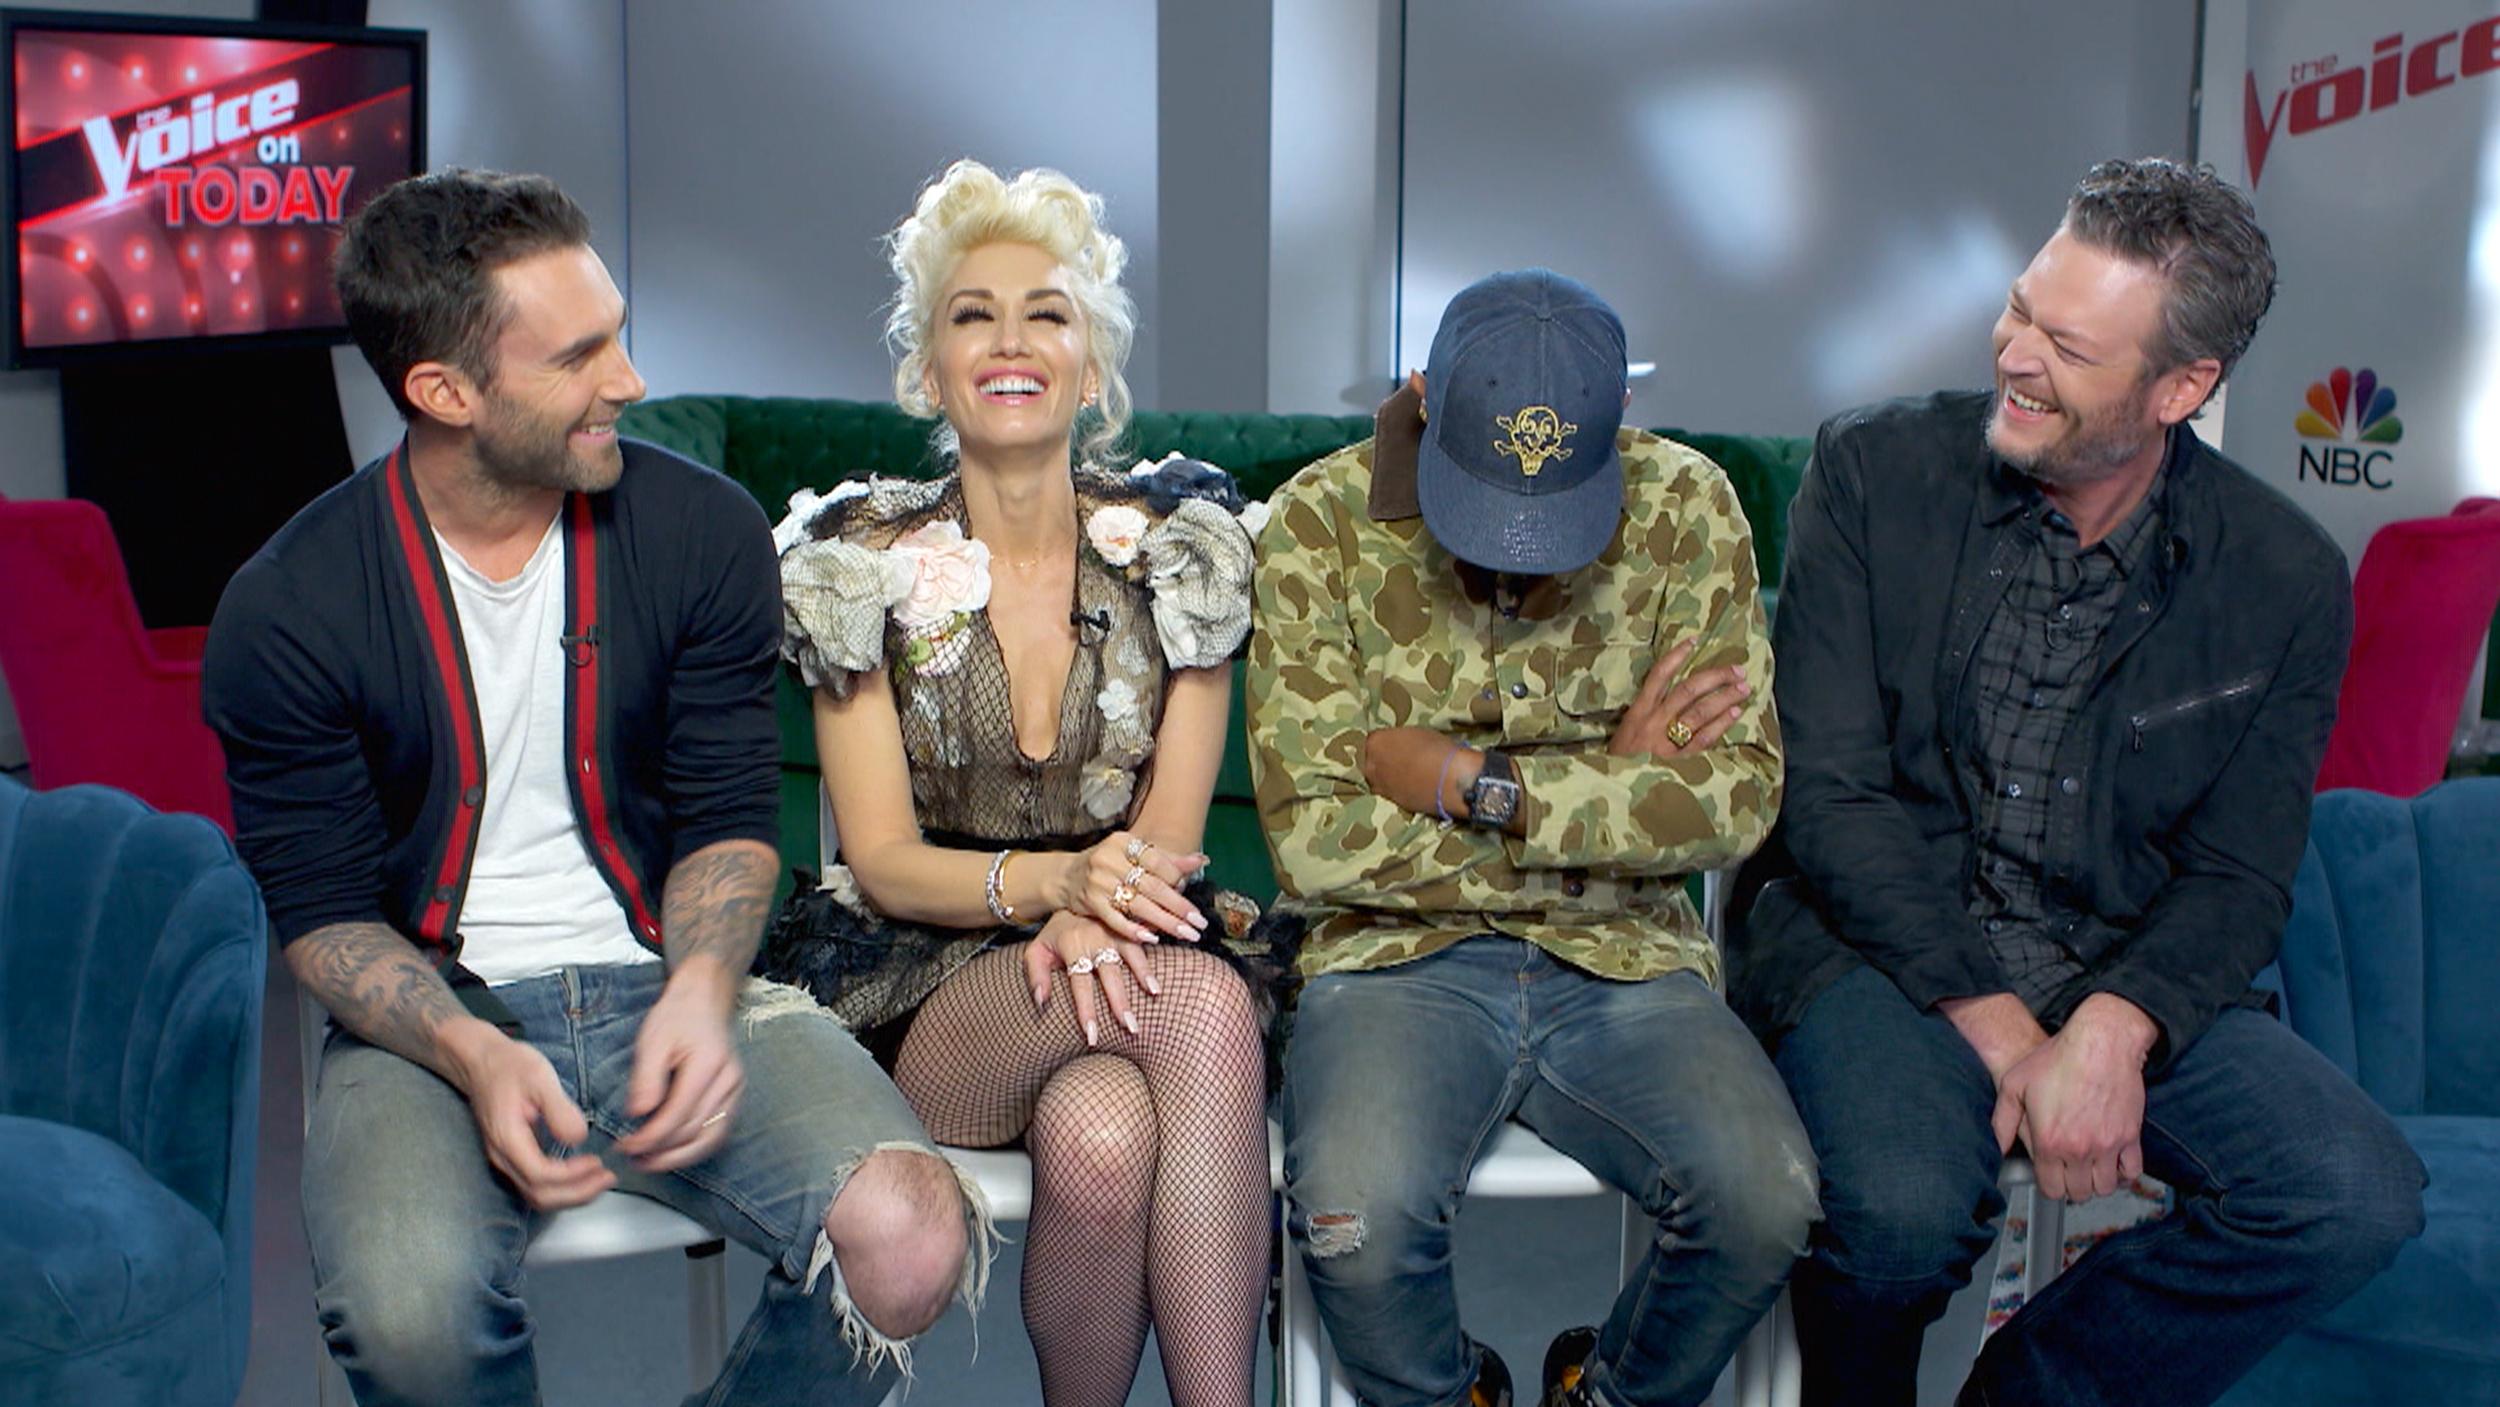 'Voice' coaches dance around topic of Gwen Stefani and Blake Shelton's romance